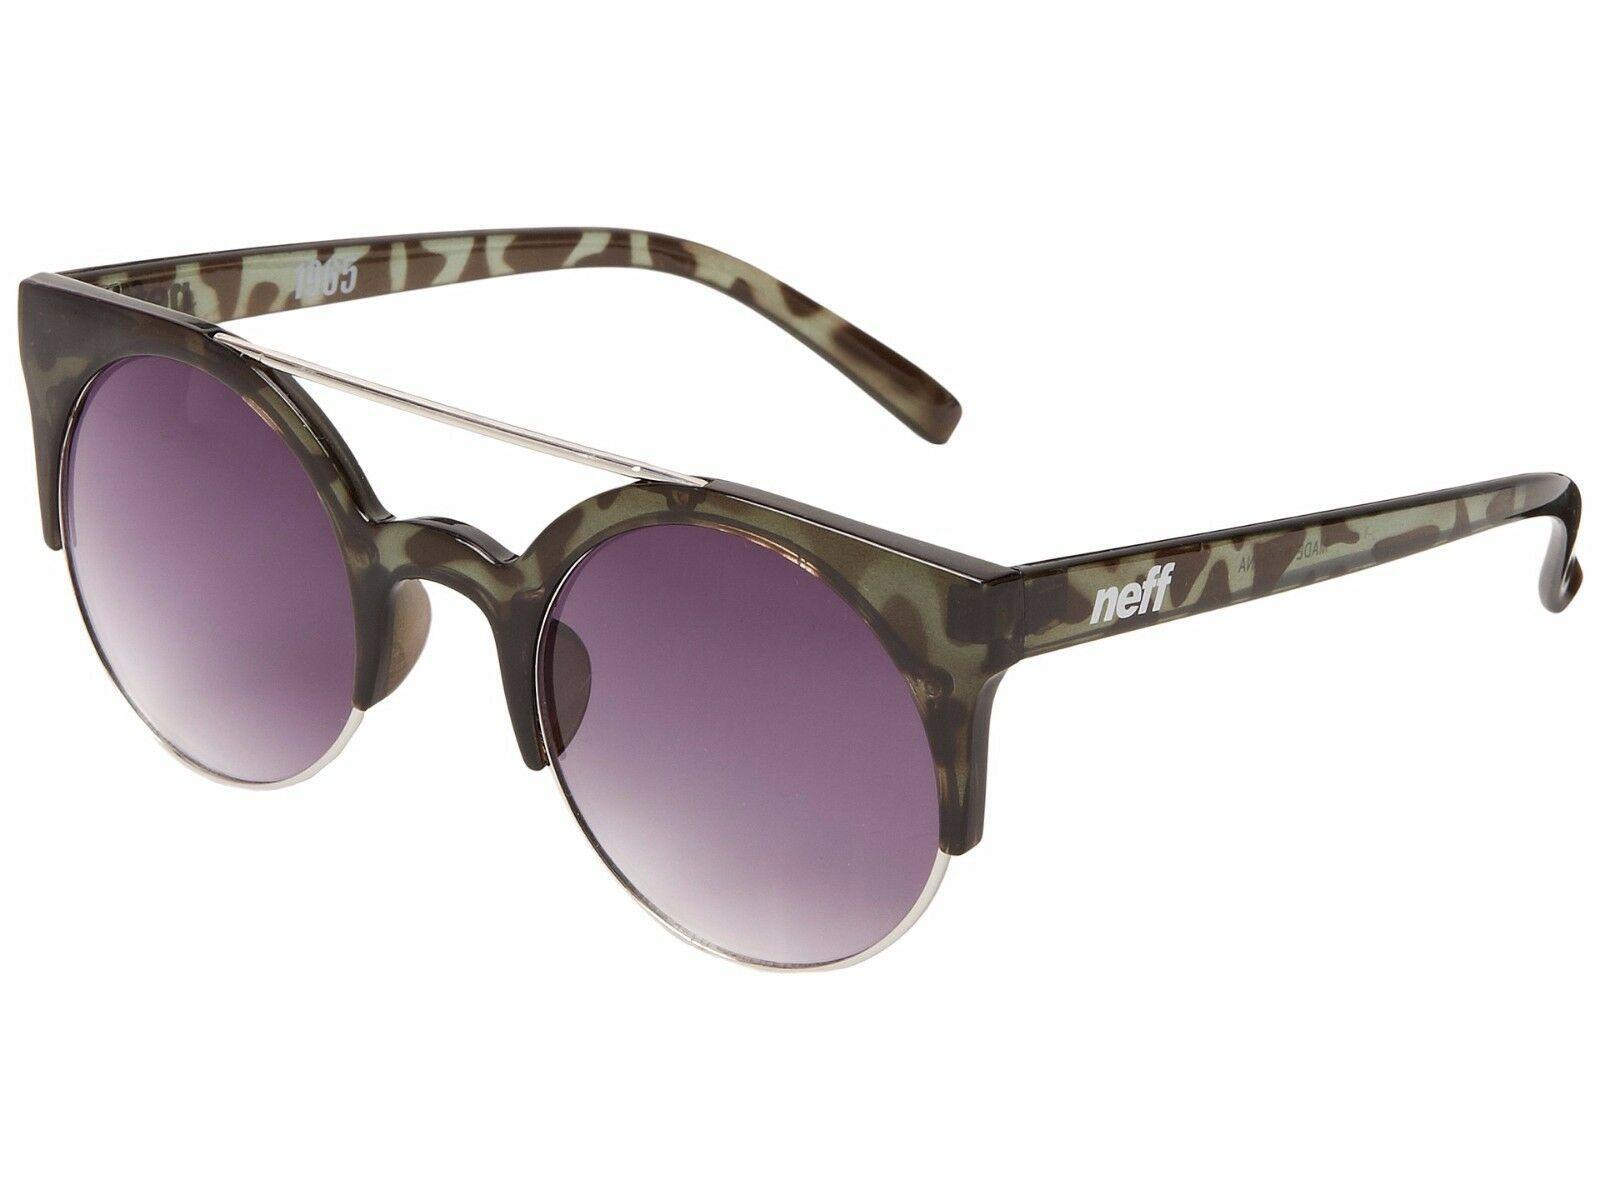 Neff Leopard Acetate Metal Round 1965 Style 400 UV Shades Sunglasses Sunnies NWT